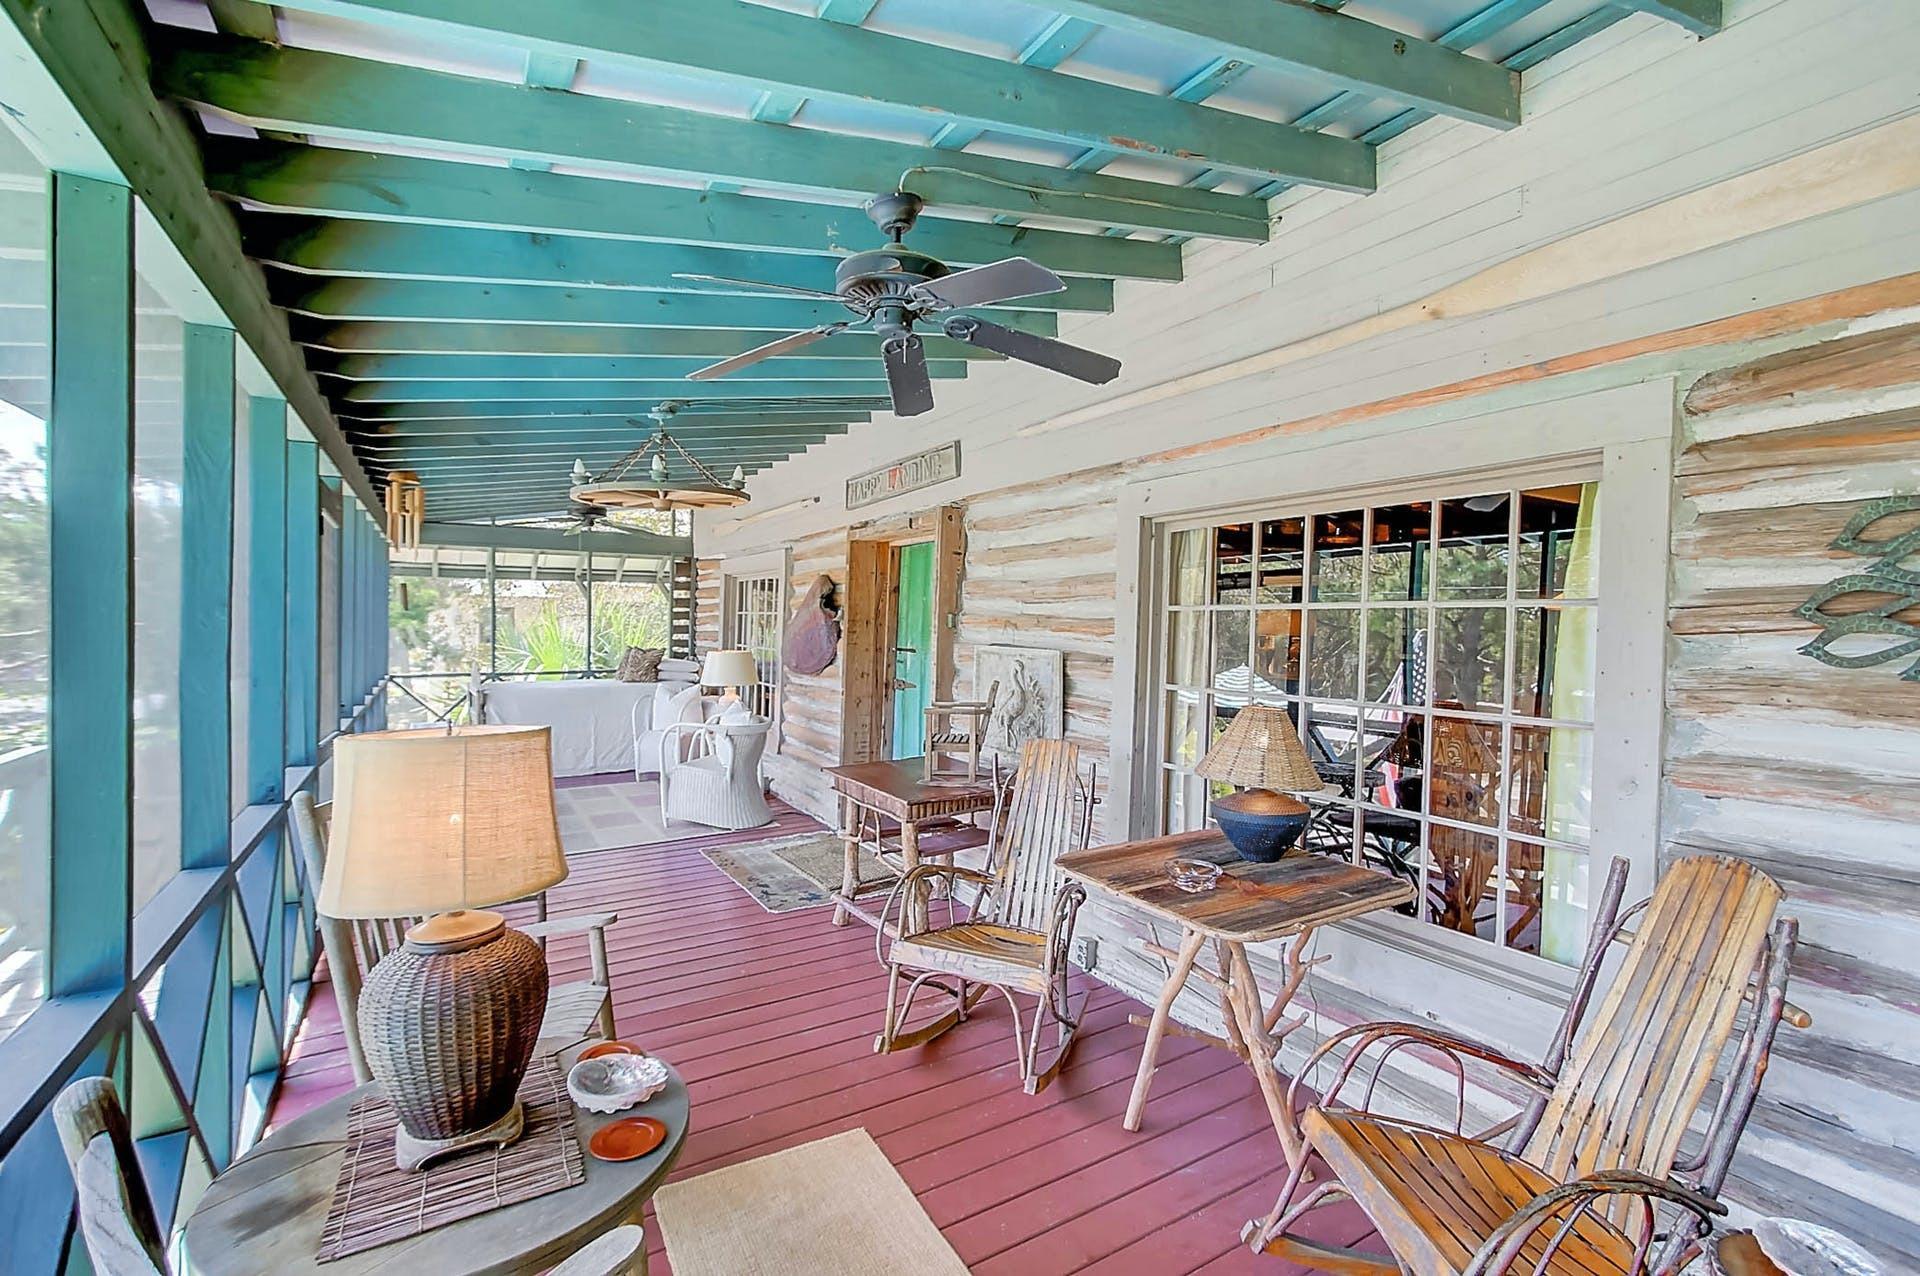 Folly Beach Homes For Sale - 306 Cooper, Folly Beach, SC - 22